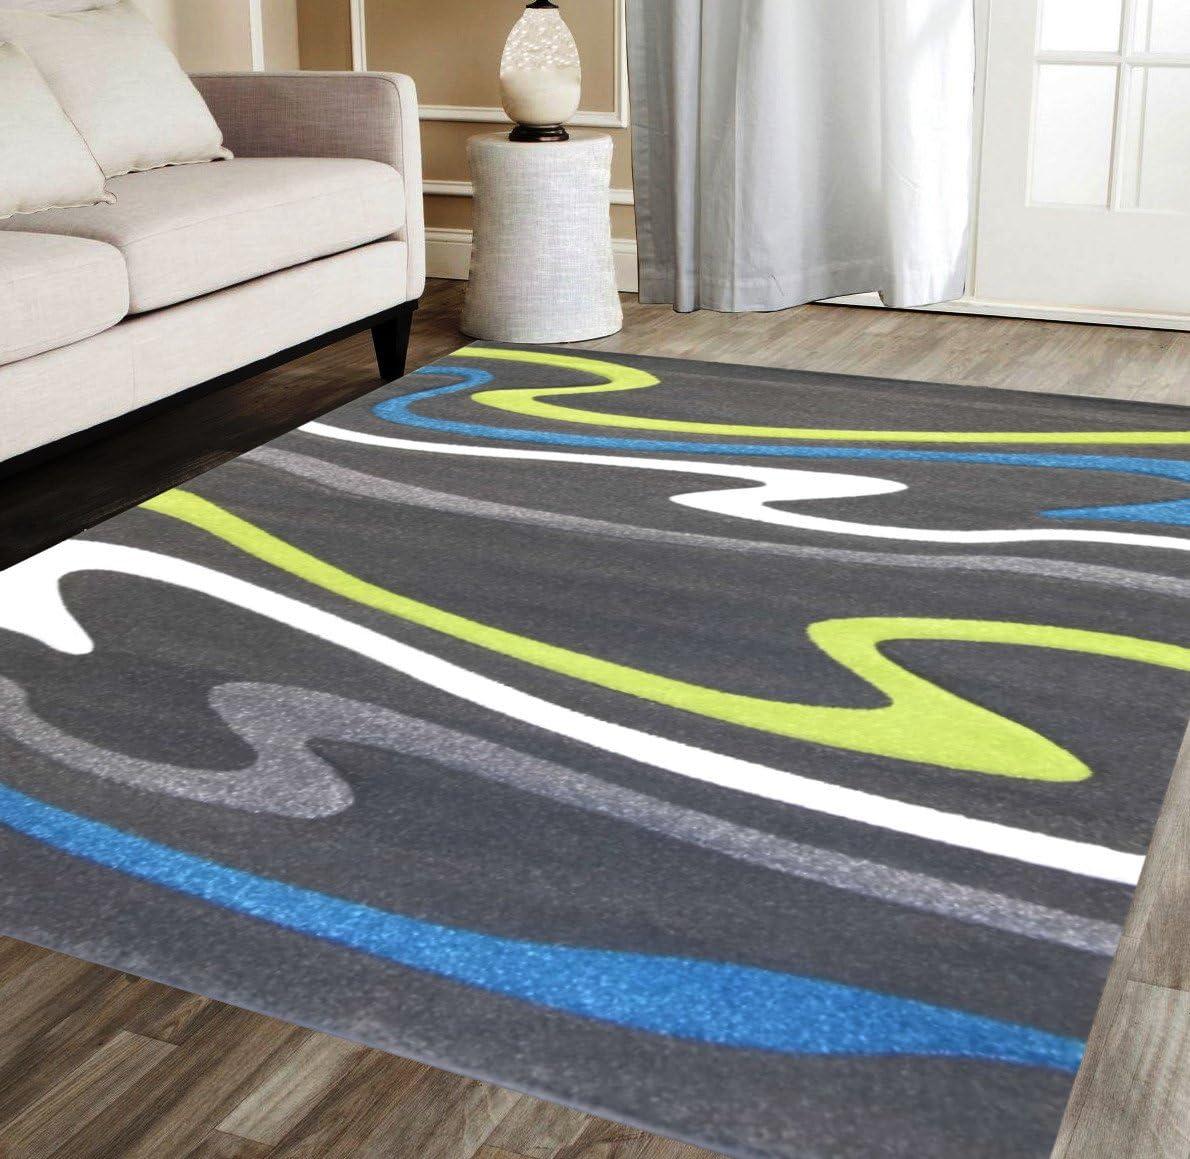 Modern Area Rug Design ST 603 Charcoal 8 Feet X 10 Feet 6 Inch